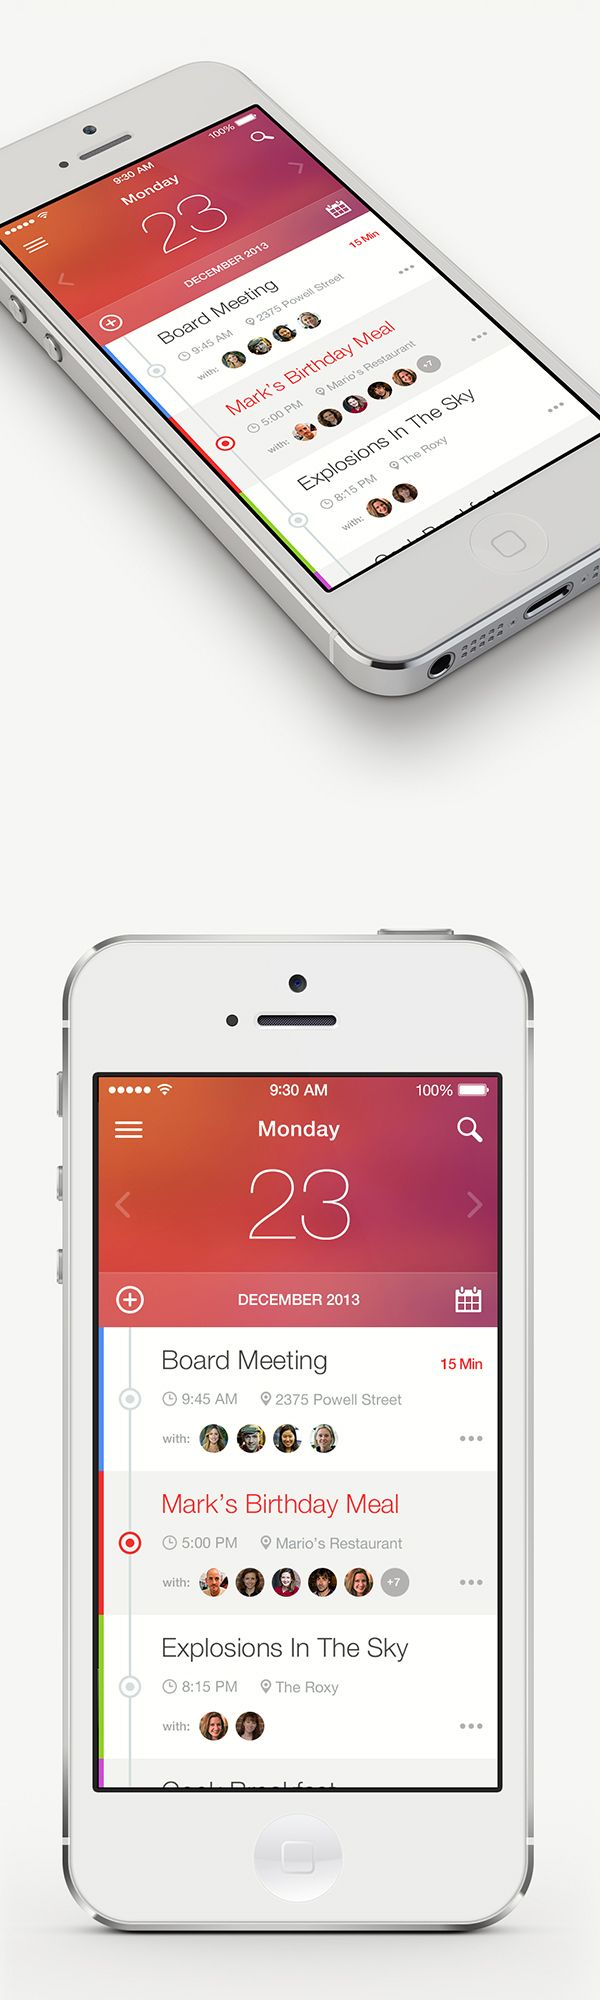 Calendar Planner #WebDesign #ResponsiveDesign #Design #Web #UI #UX #GUI #mobille #Amazing #Responsive